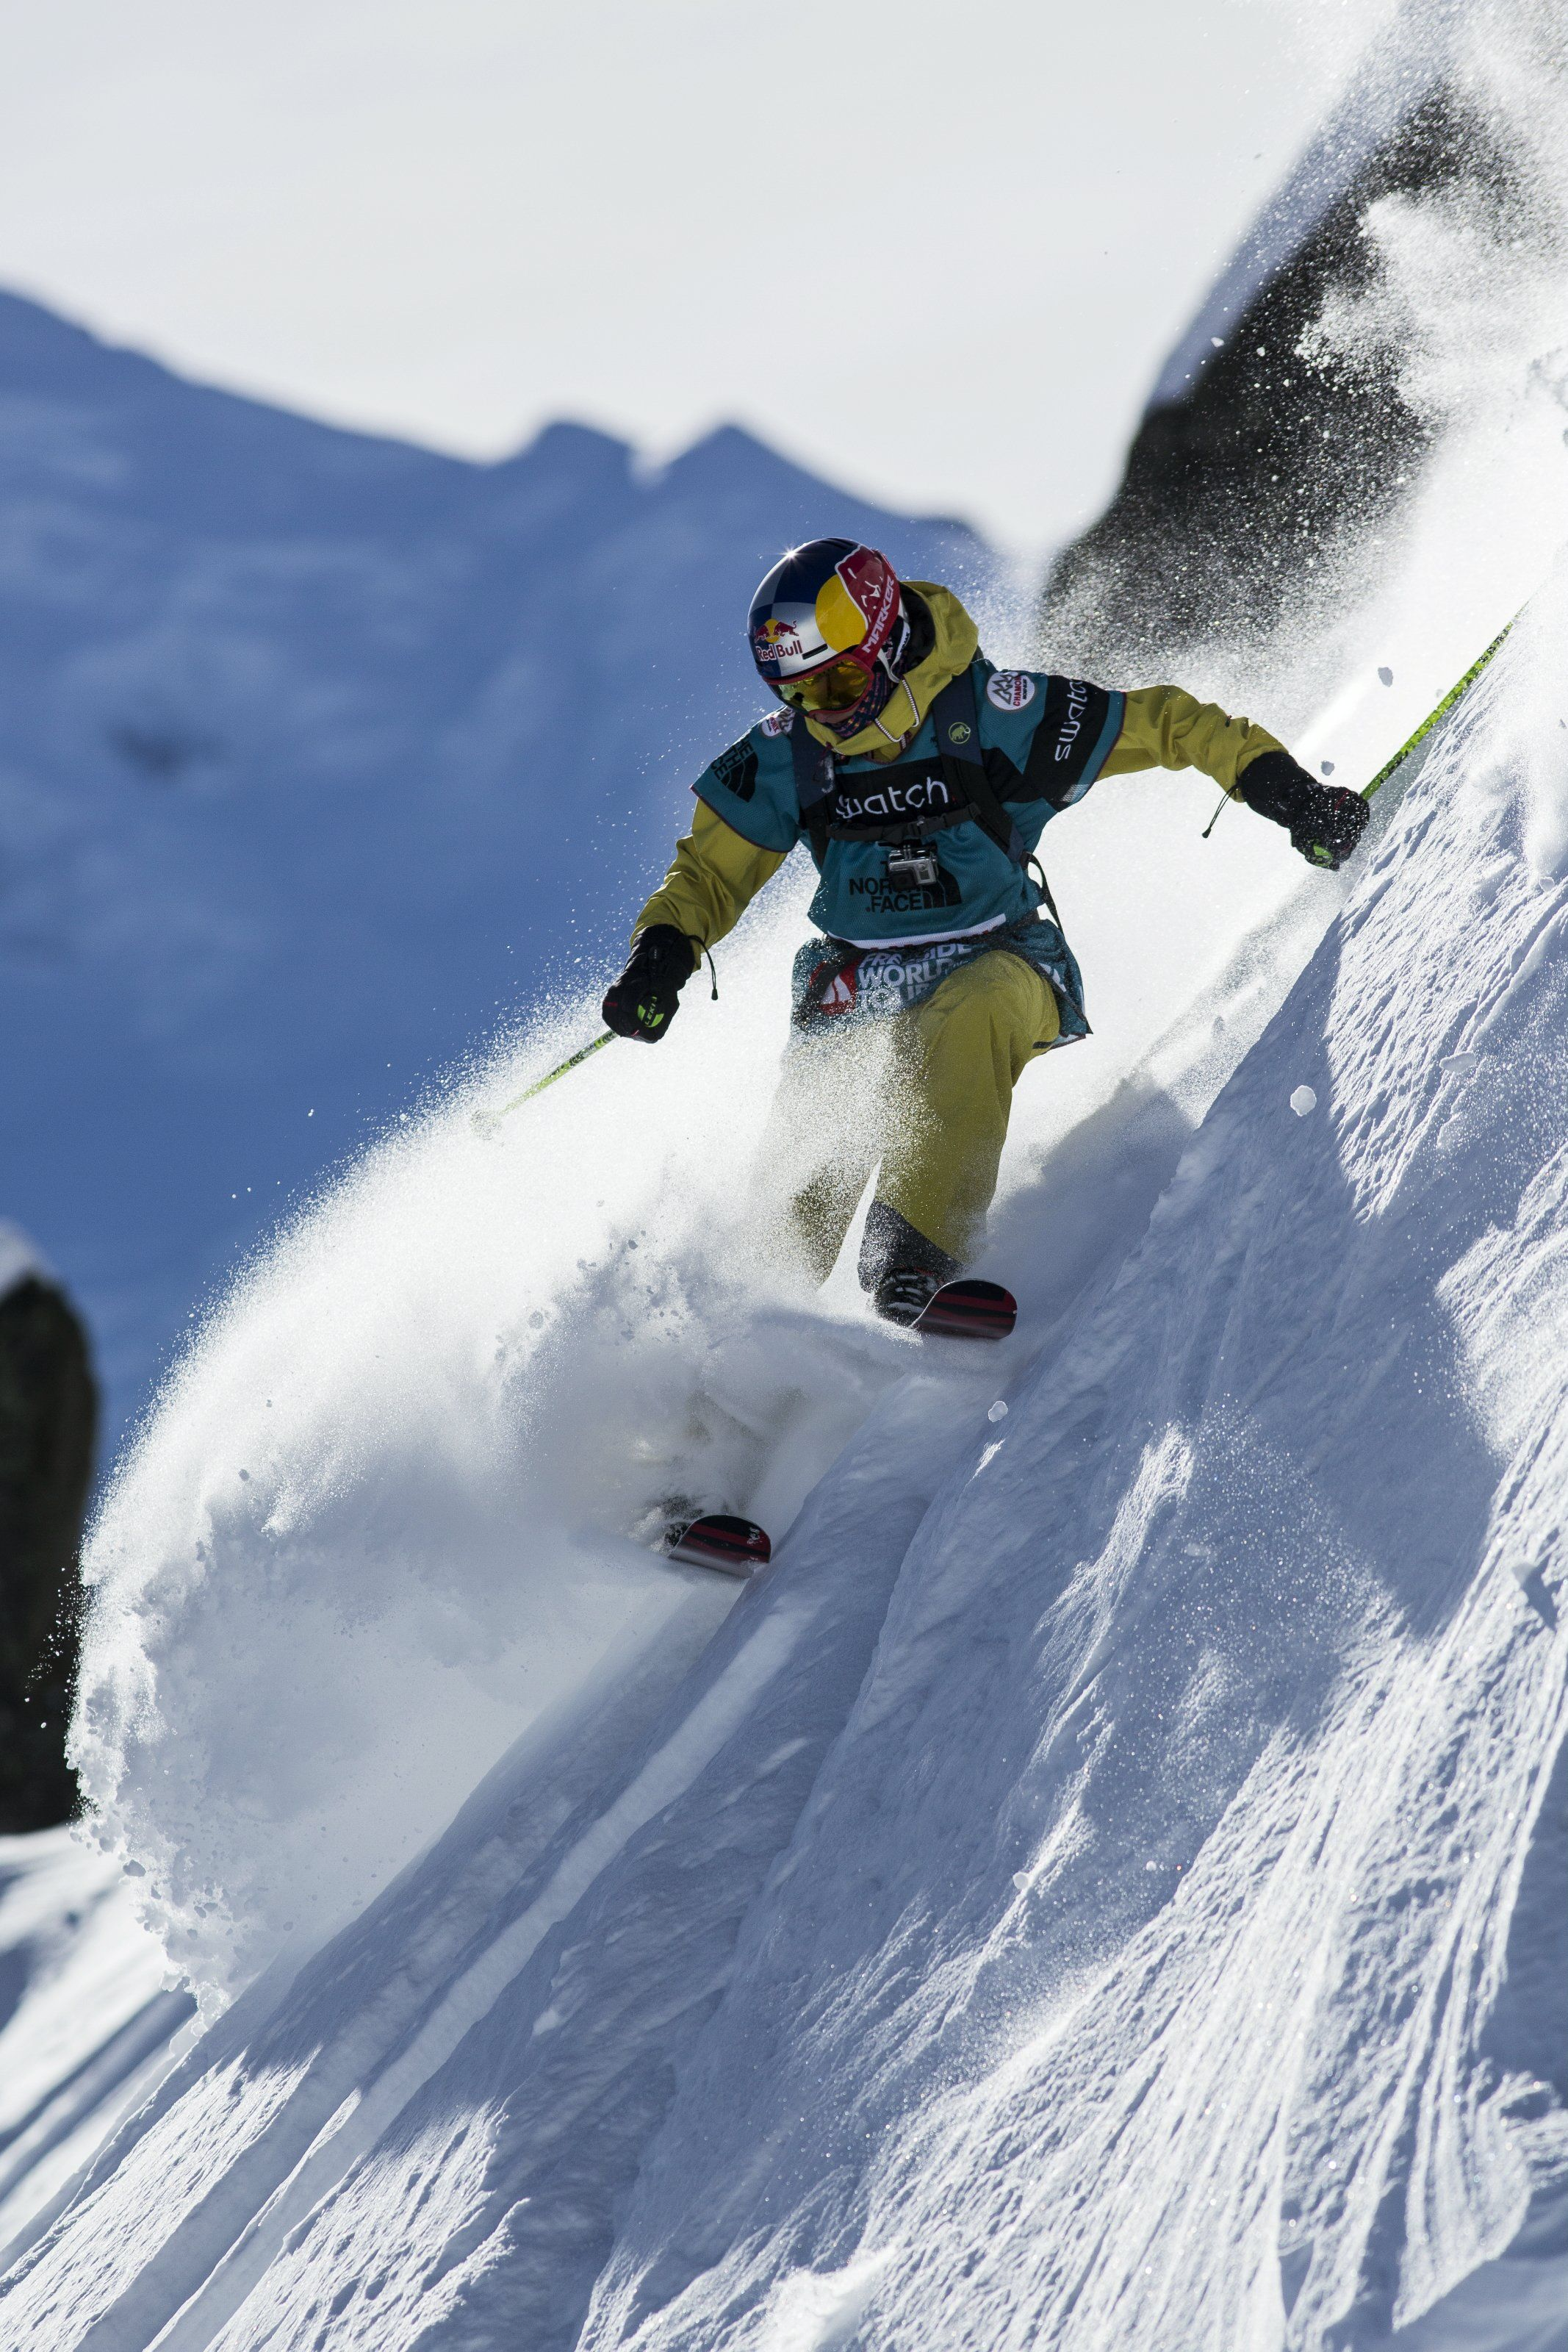 15 Best Ski Freeride images | Skiing, Scott sports, Ski